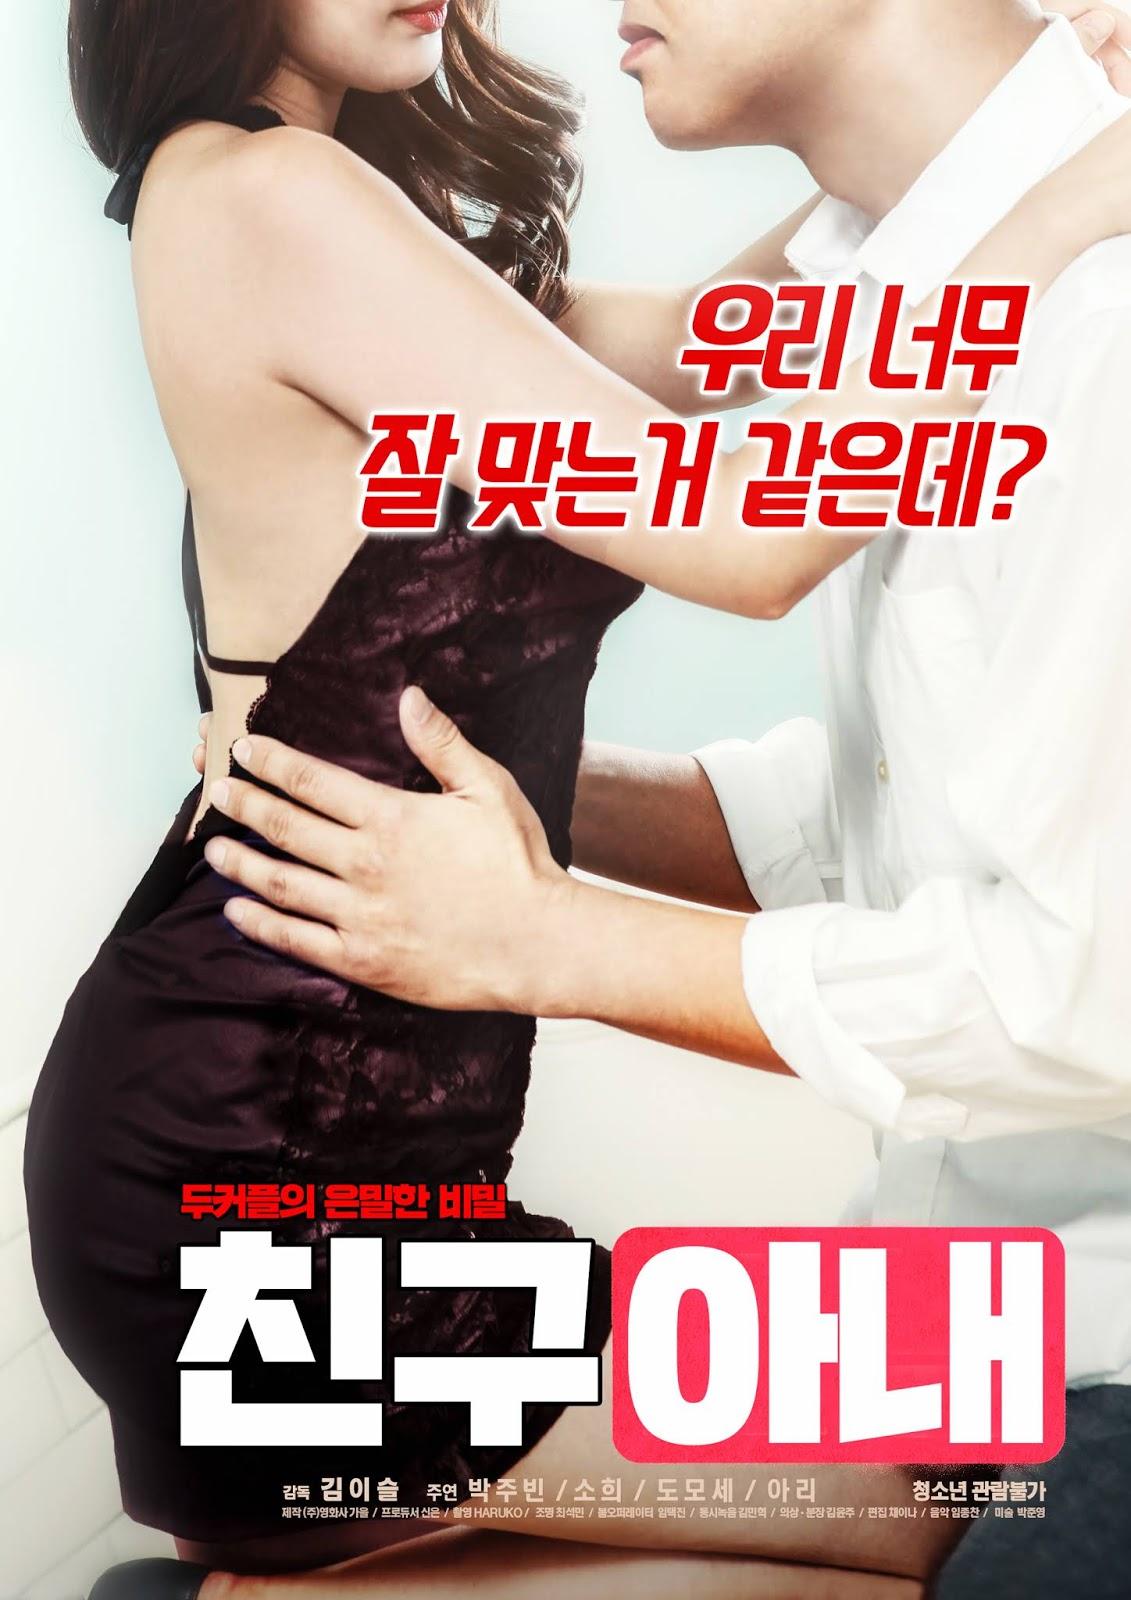 Friend wife Full Korea 18+ Adult Movie Online Free